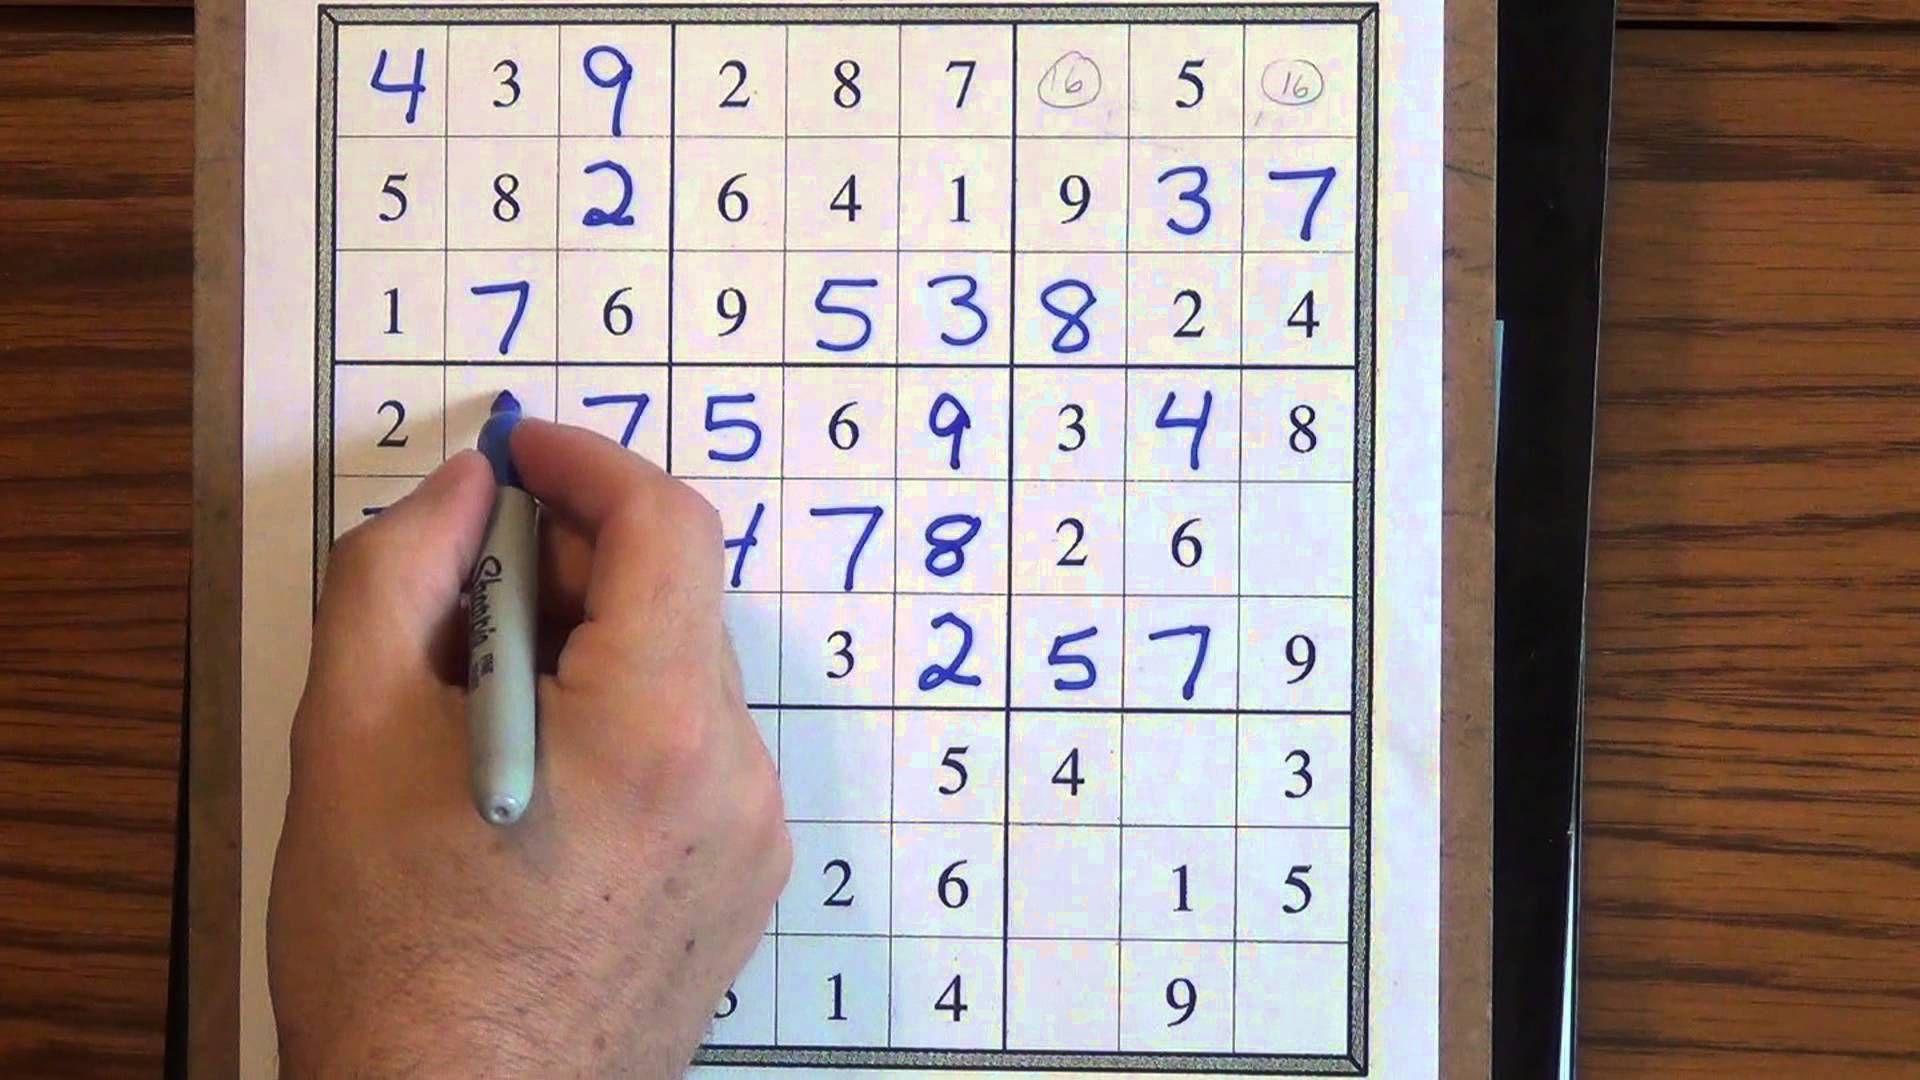 How to Solve Easy Sudoku Puzzles Sudoku puzzles, Sudoku